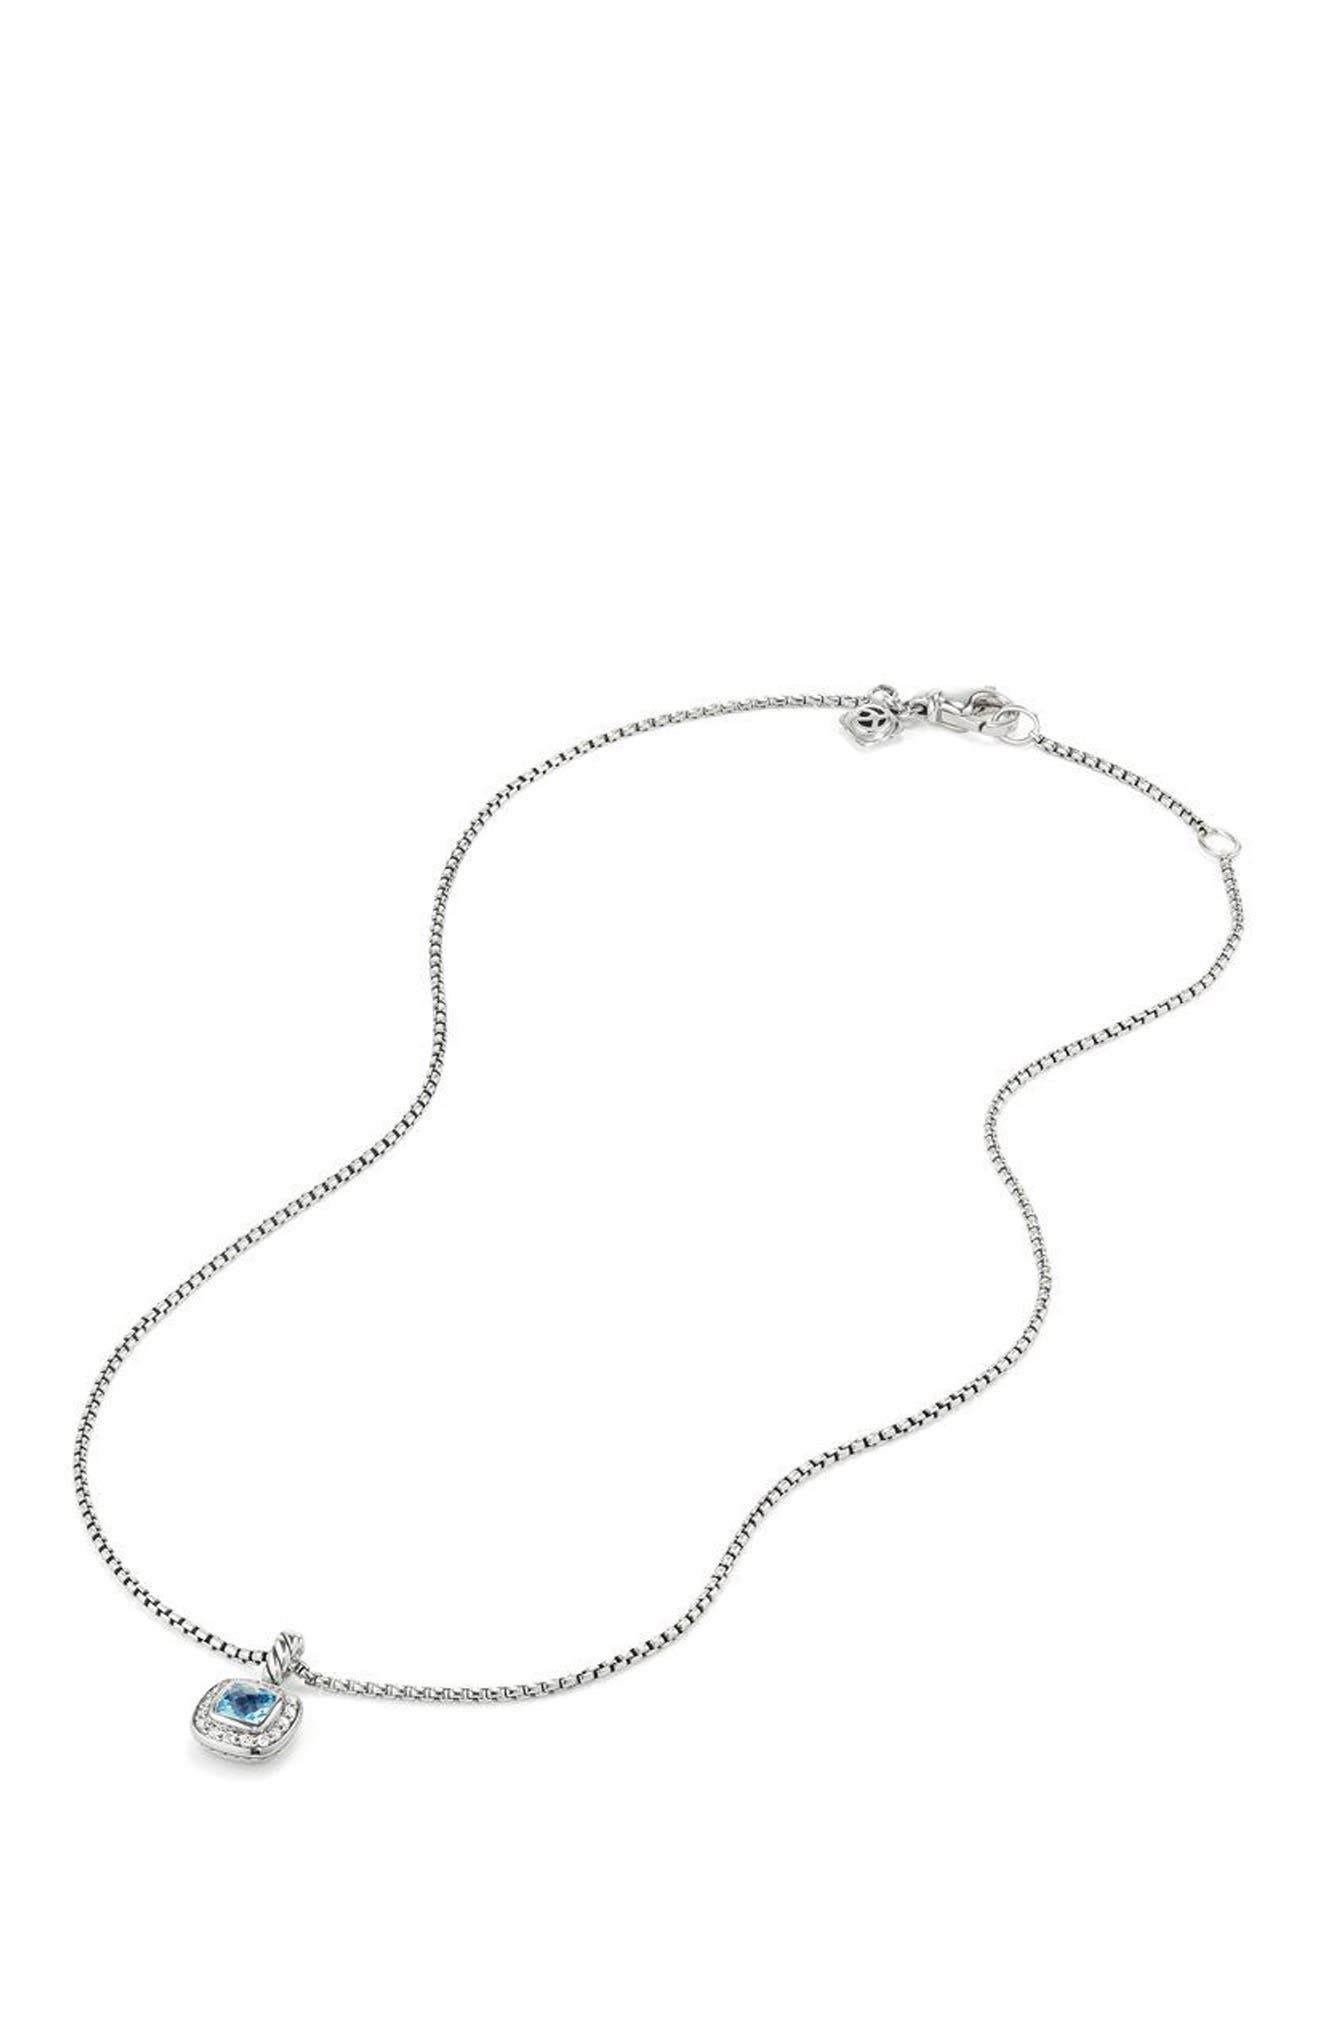 Albion<sup>®</sup> Necklace with Diamonds,                             Alternate thumbnail 3, color,                             BLUE TOPAZ